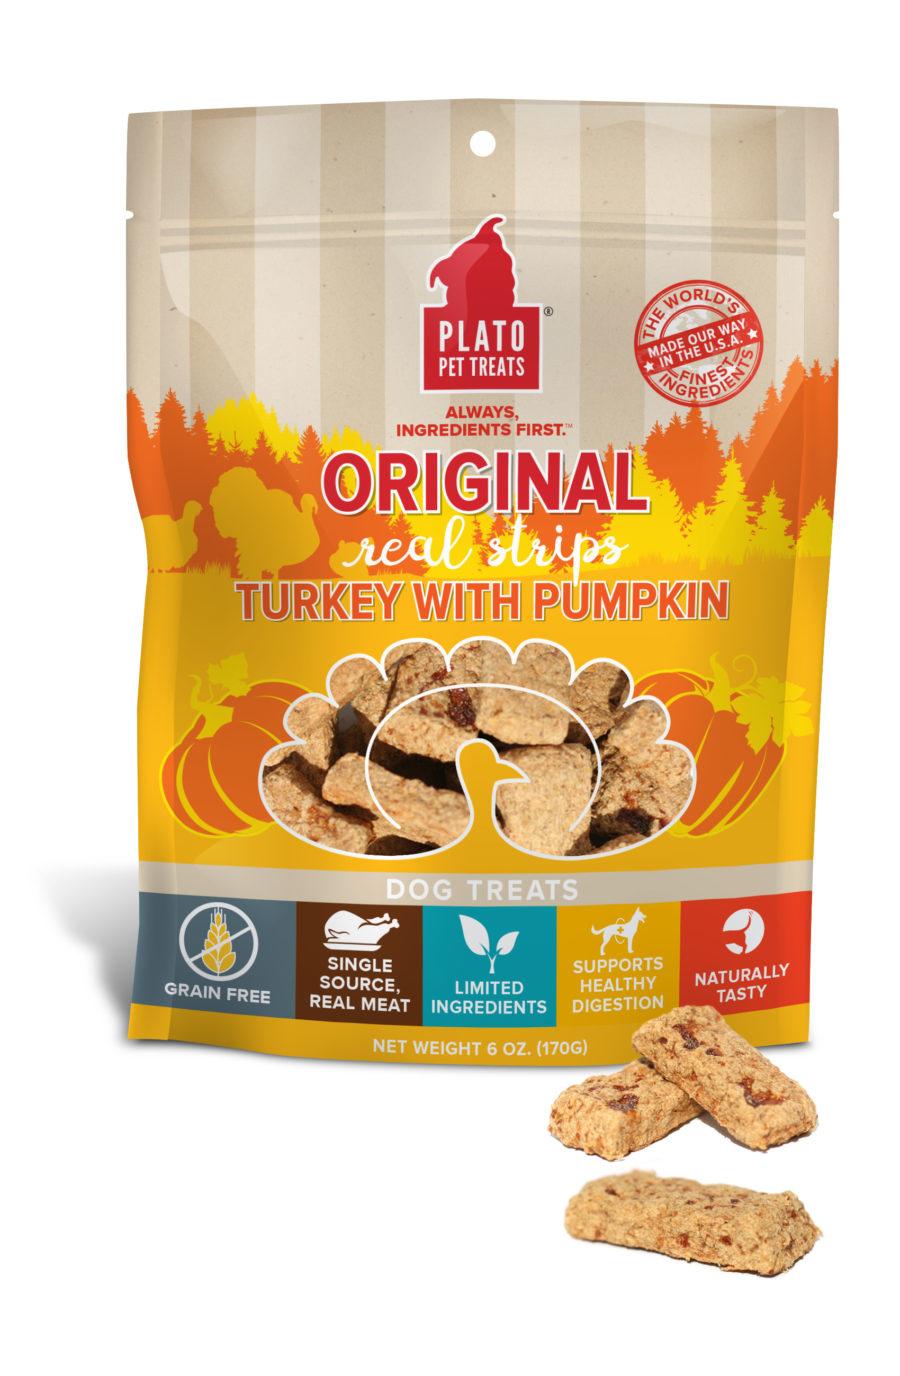 Plato Pet Treats Plato Original Real Strips Grain Free Turkey With Pumpkin